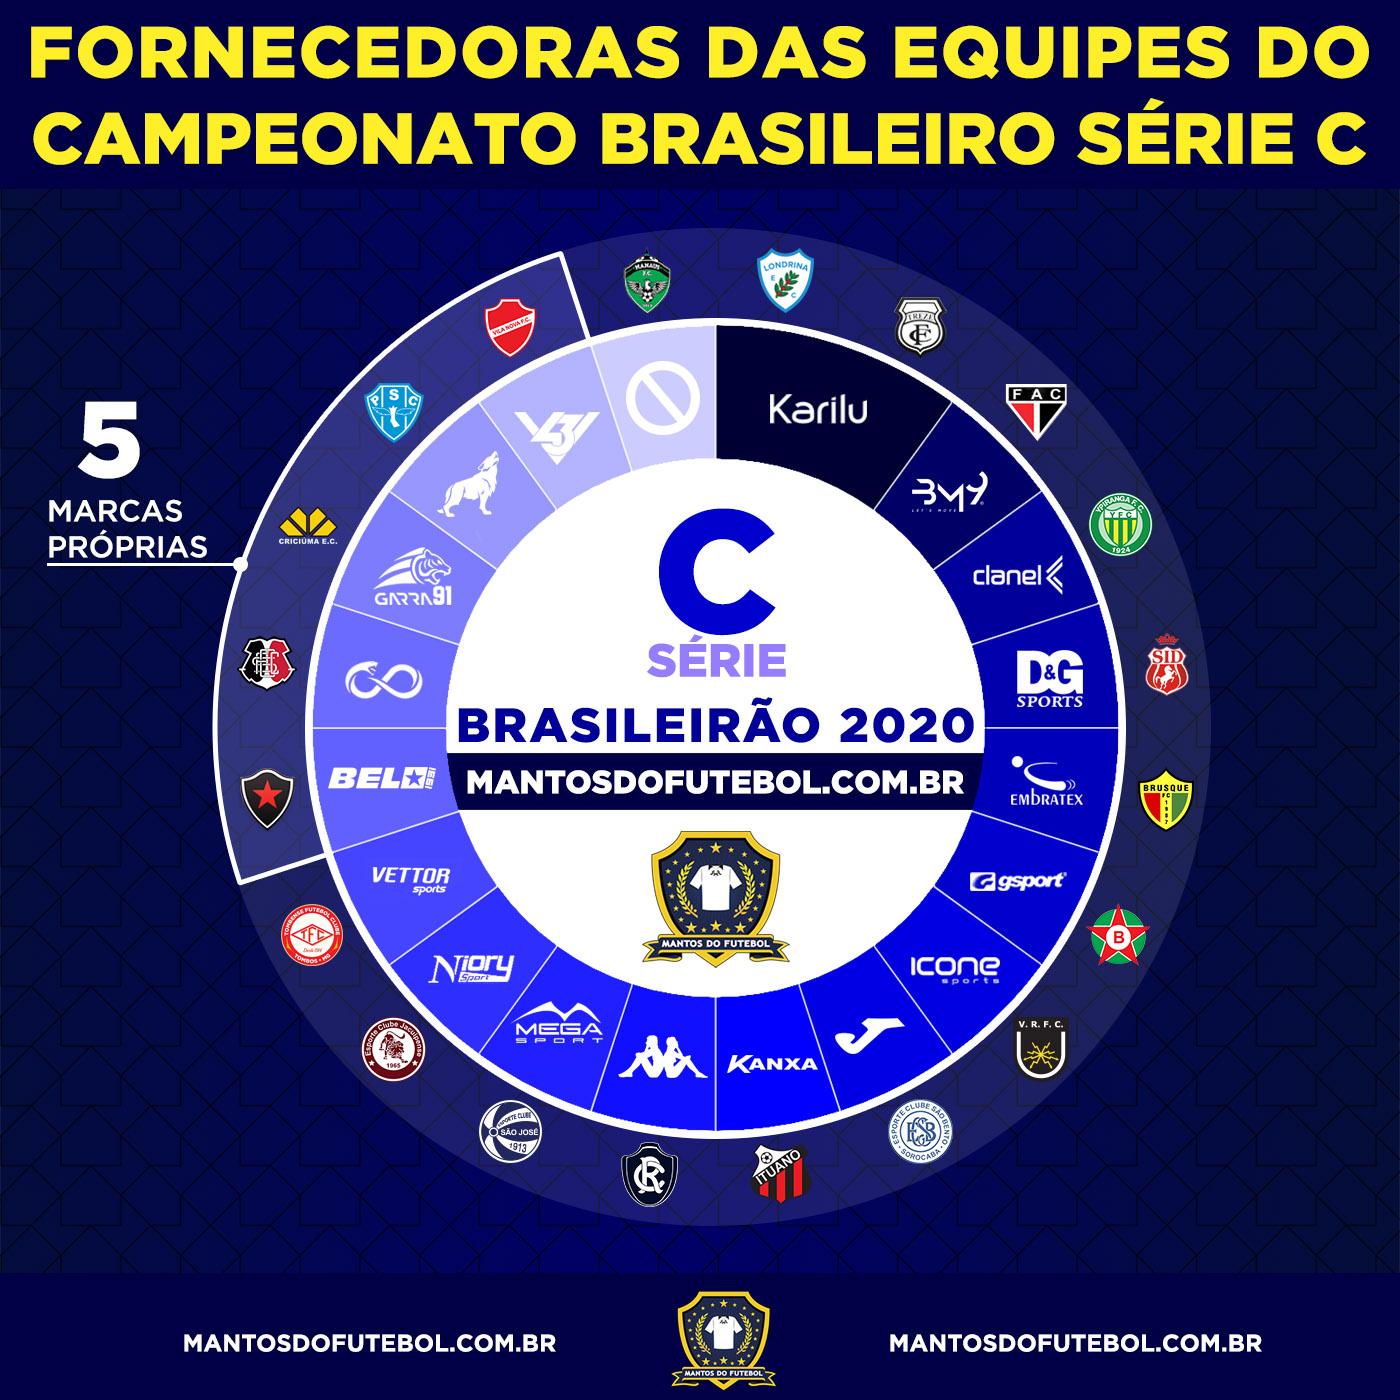 Fornecedoras BR 2020 C